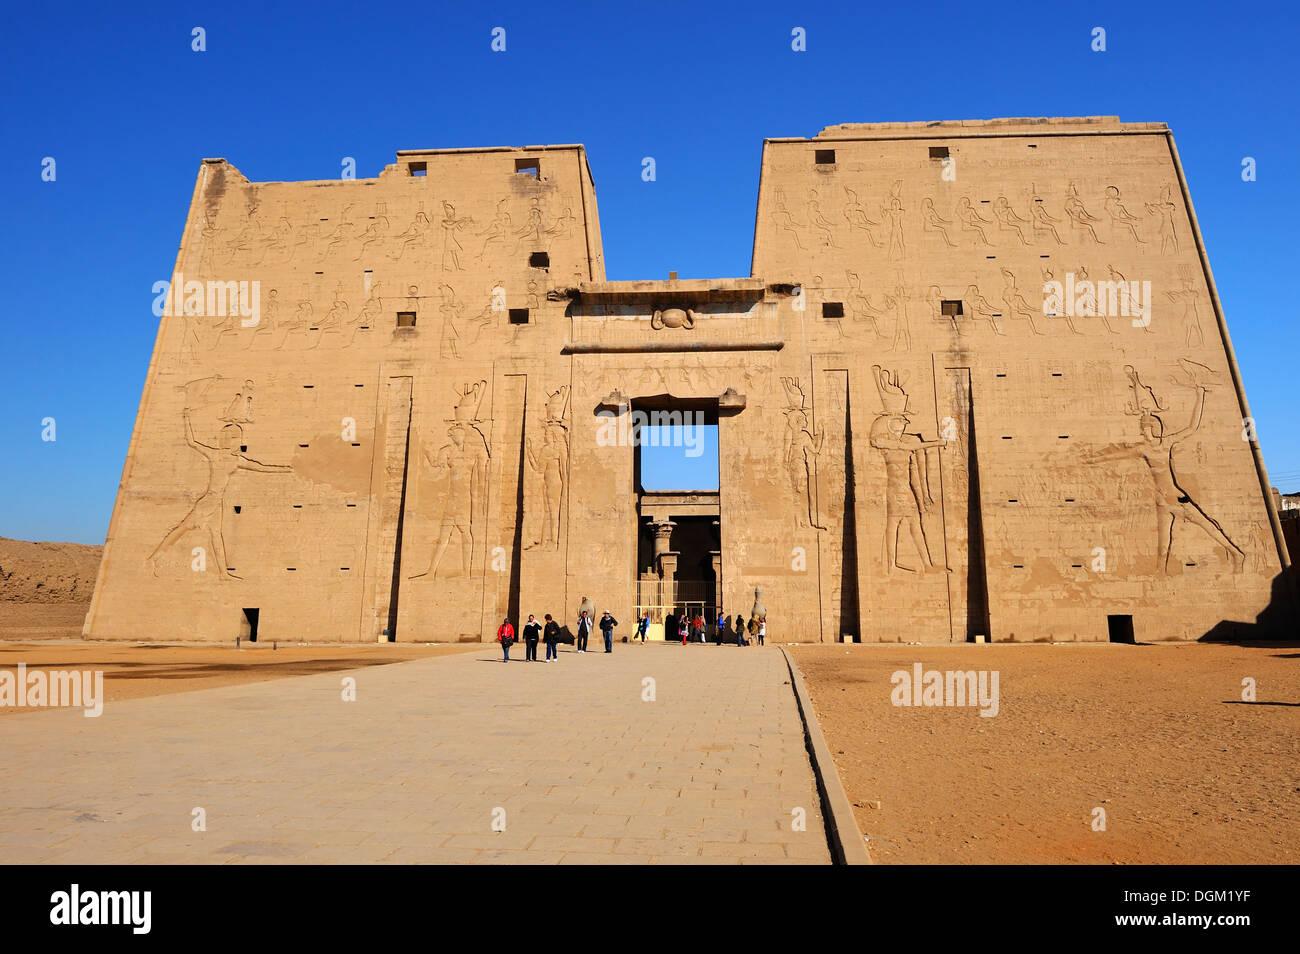 Entrance Pylon of Temple of Horus at Edfu, Upper Egypt Stock Photo